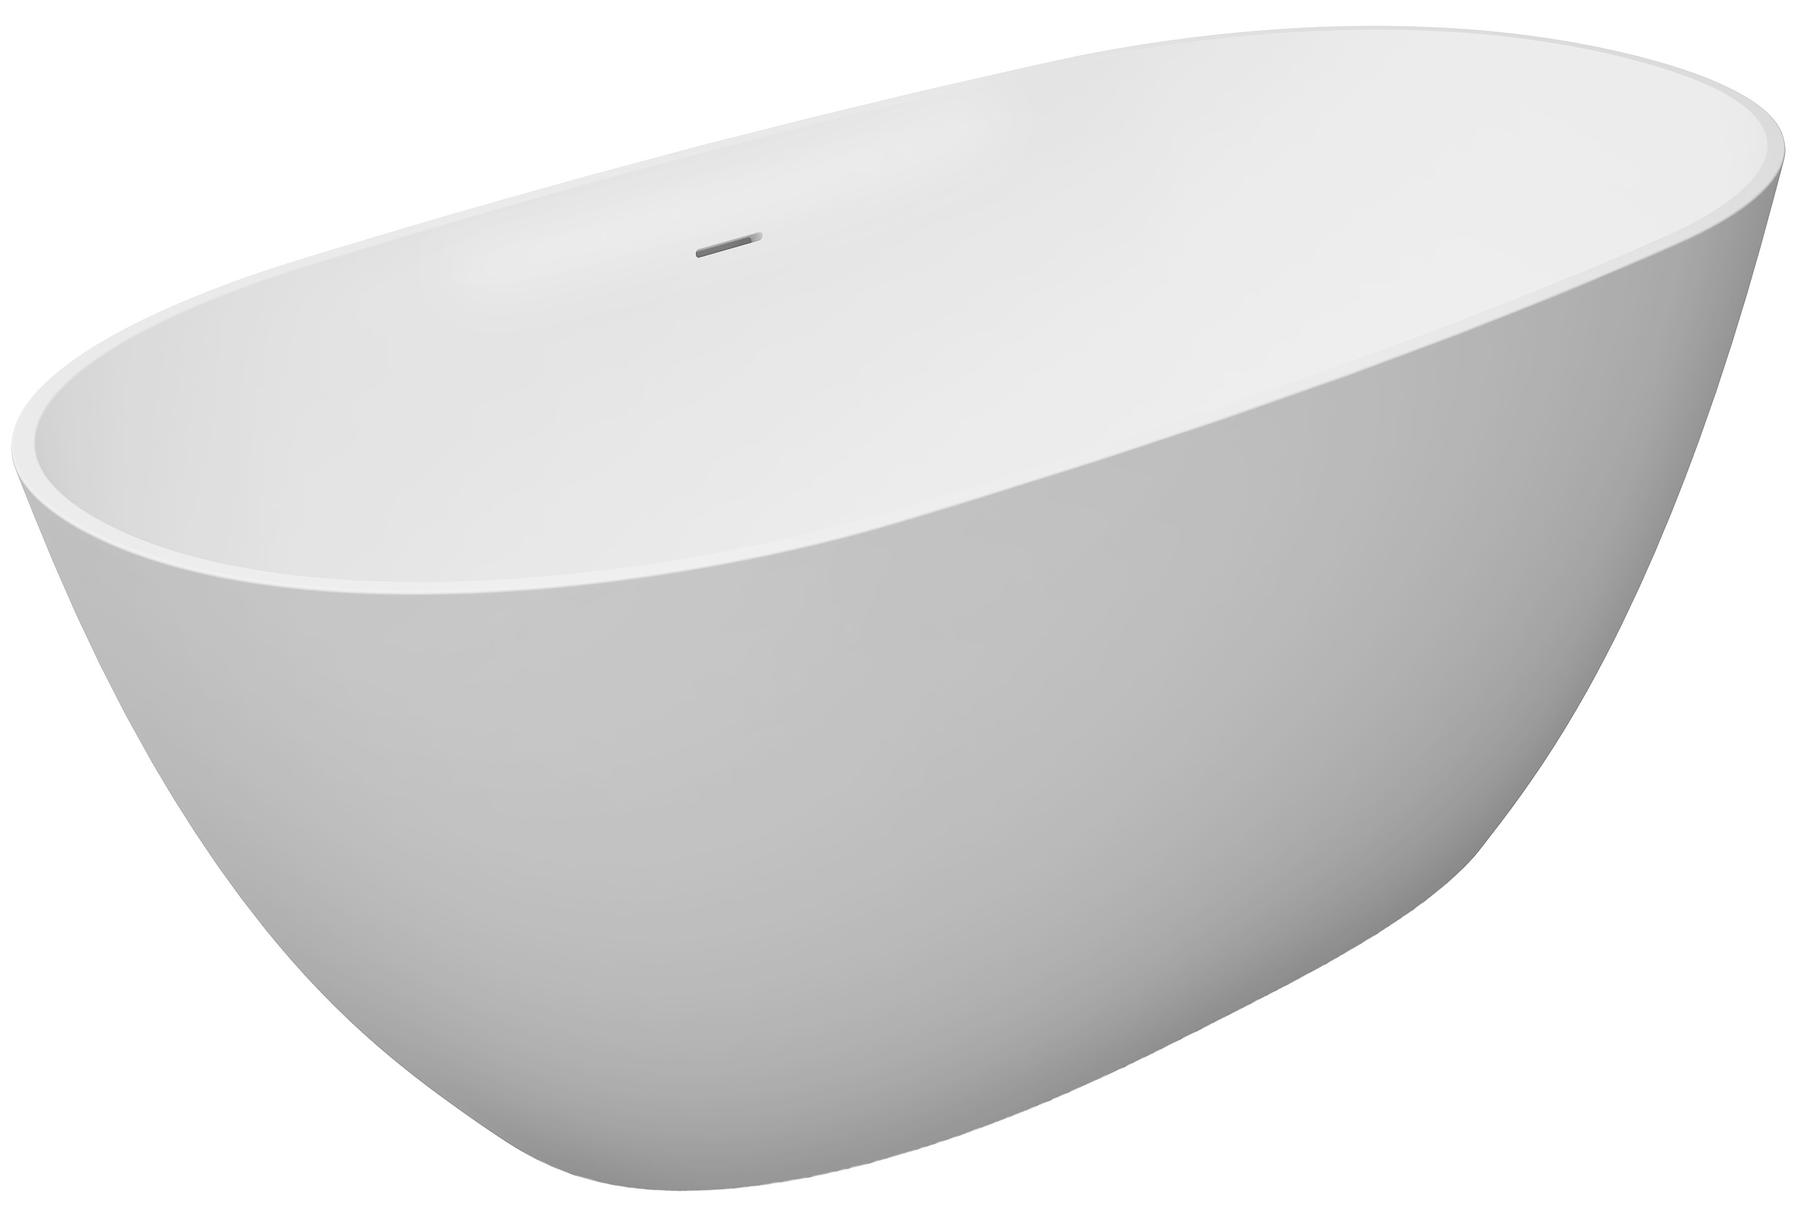 Mineral charge bathtub